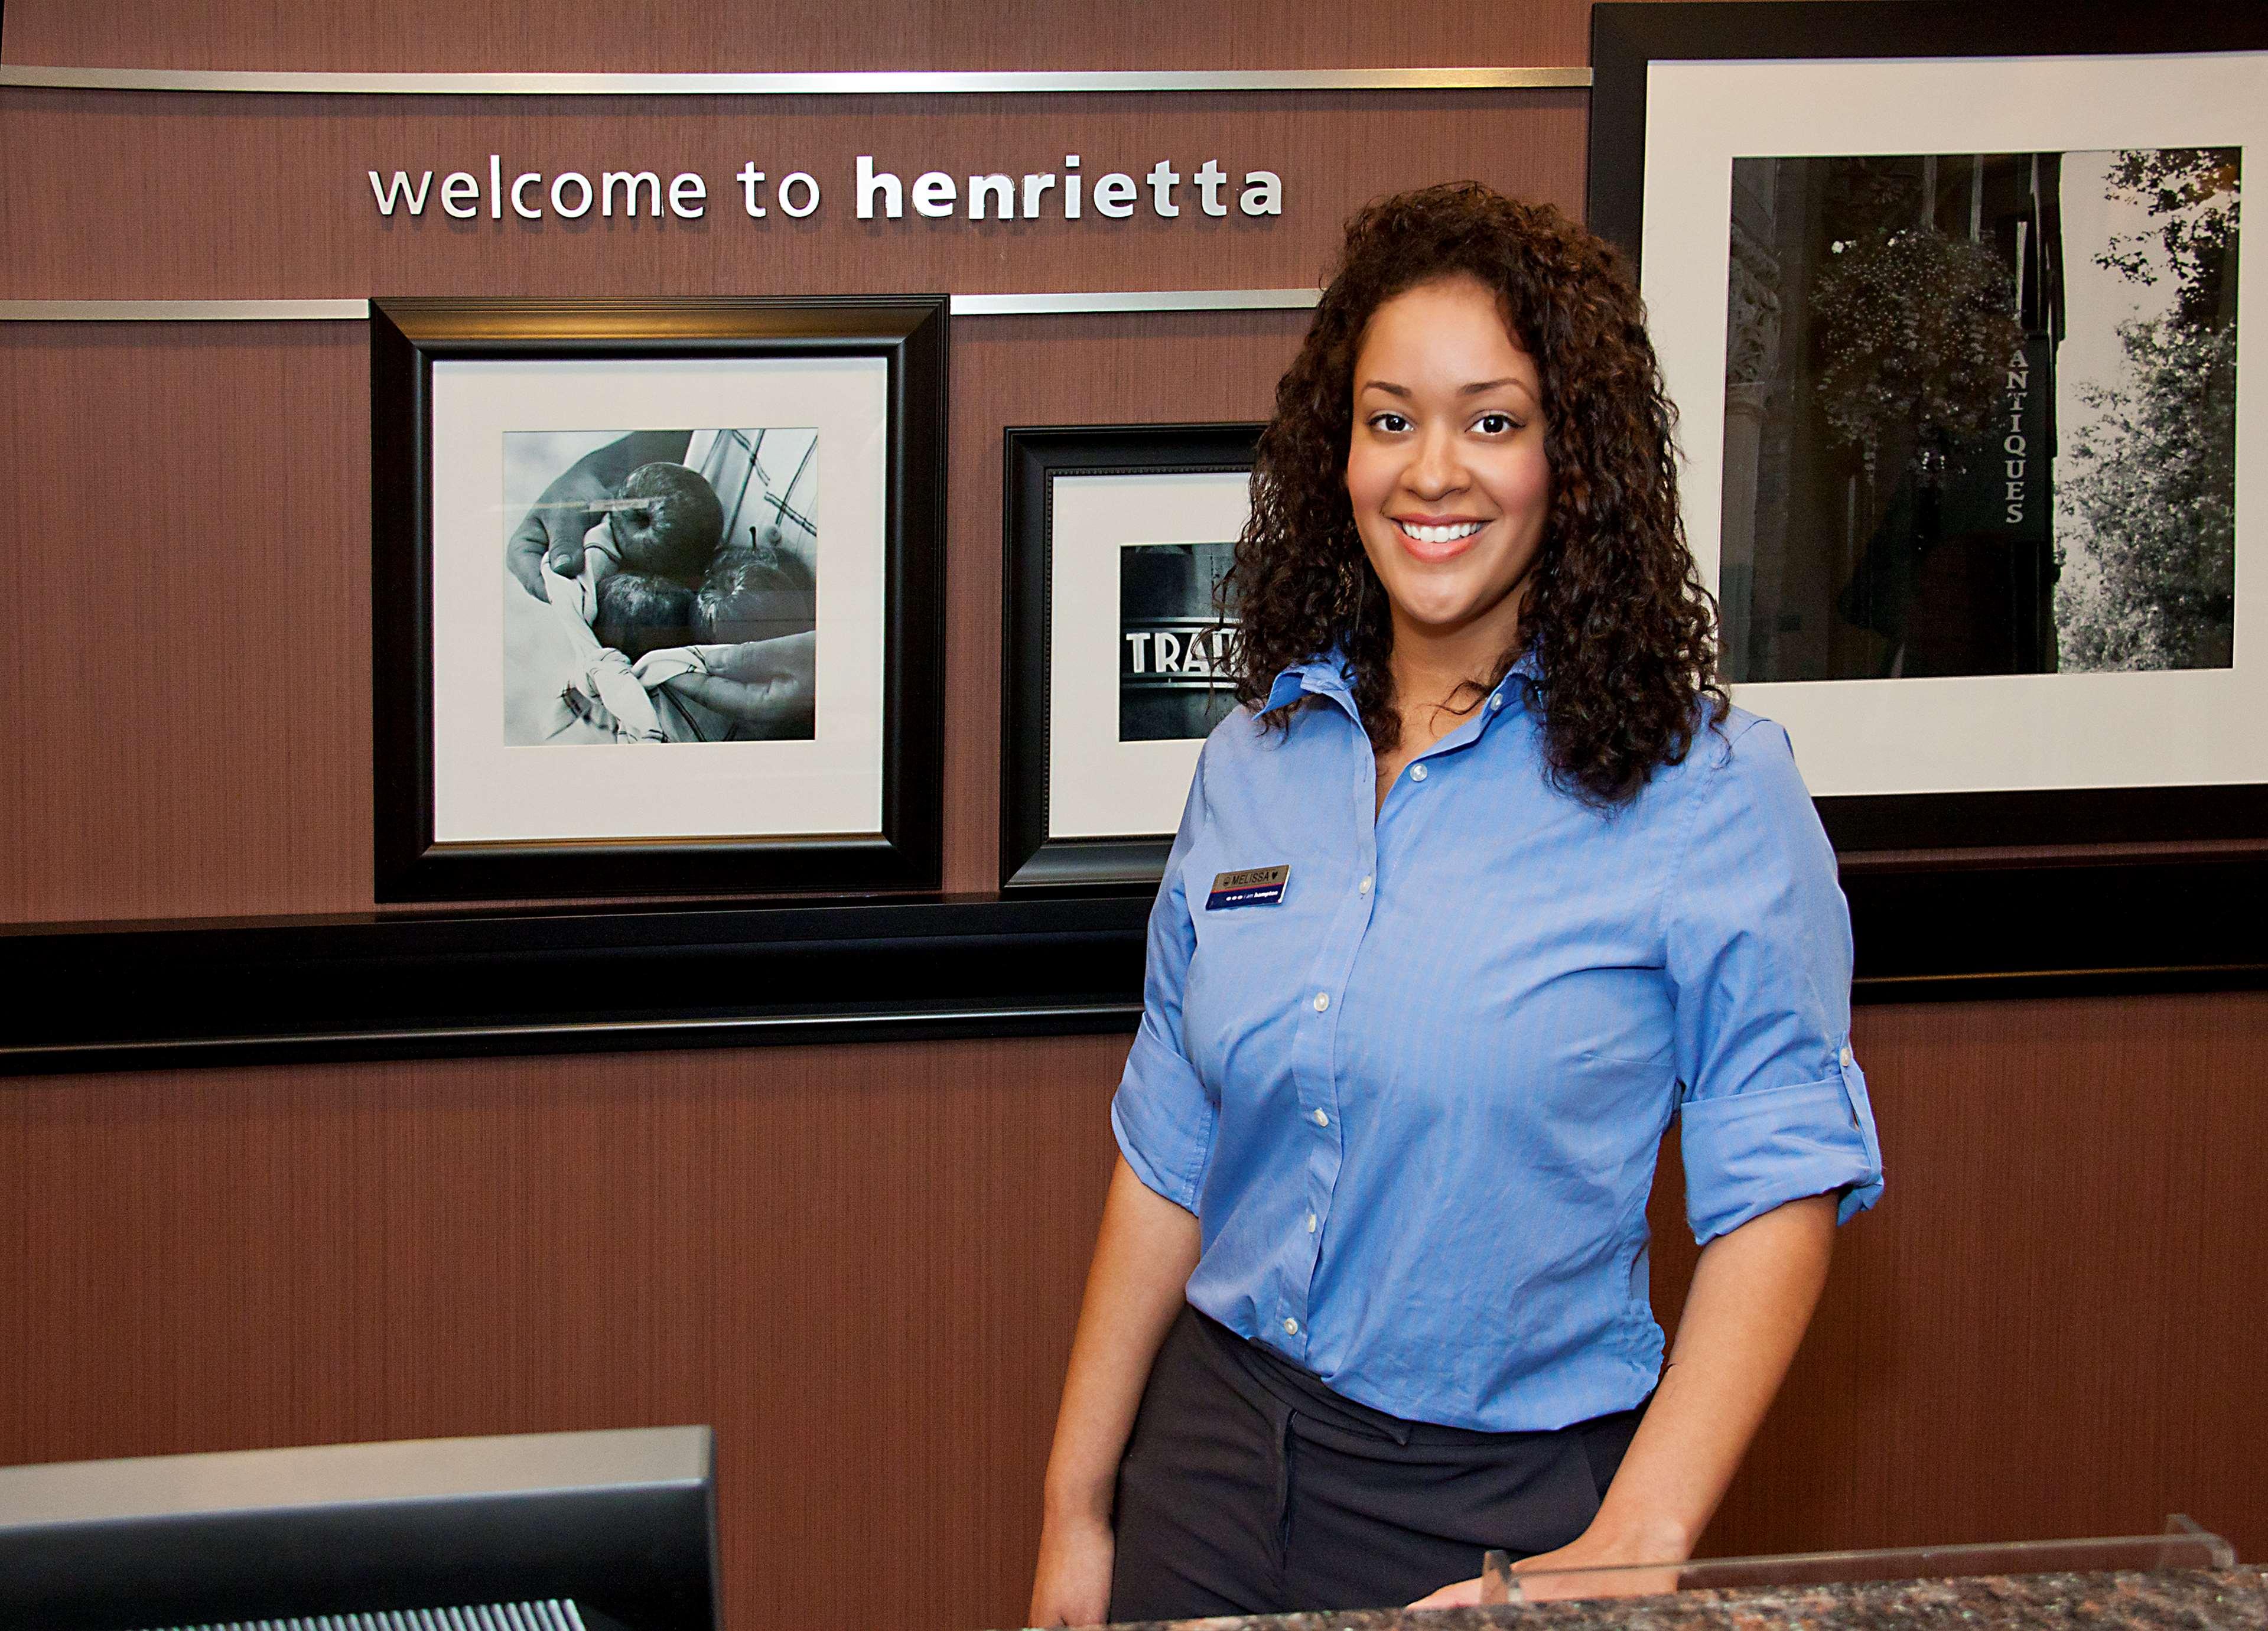 Hampton Inn & Suites Rochester/Henrietta image 5